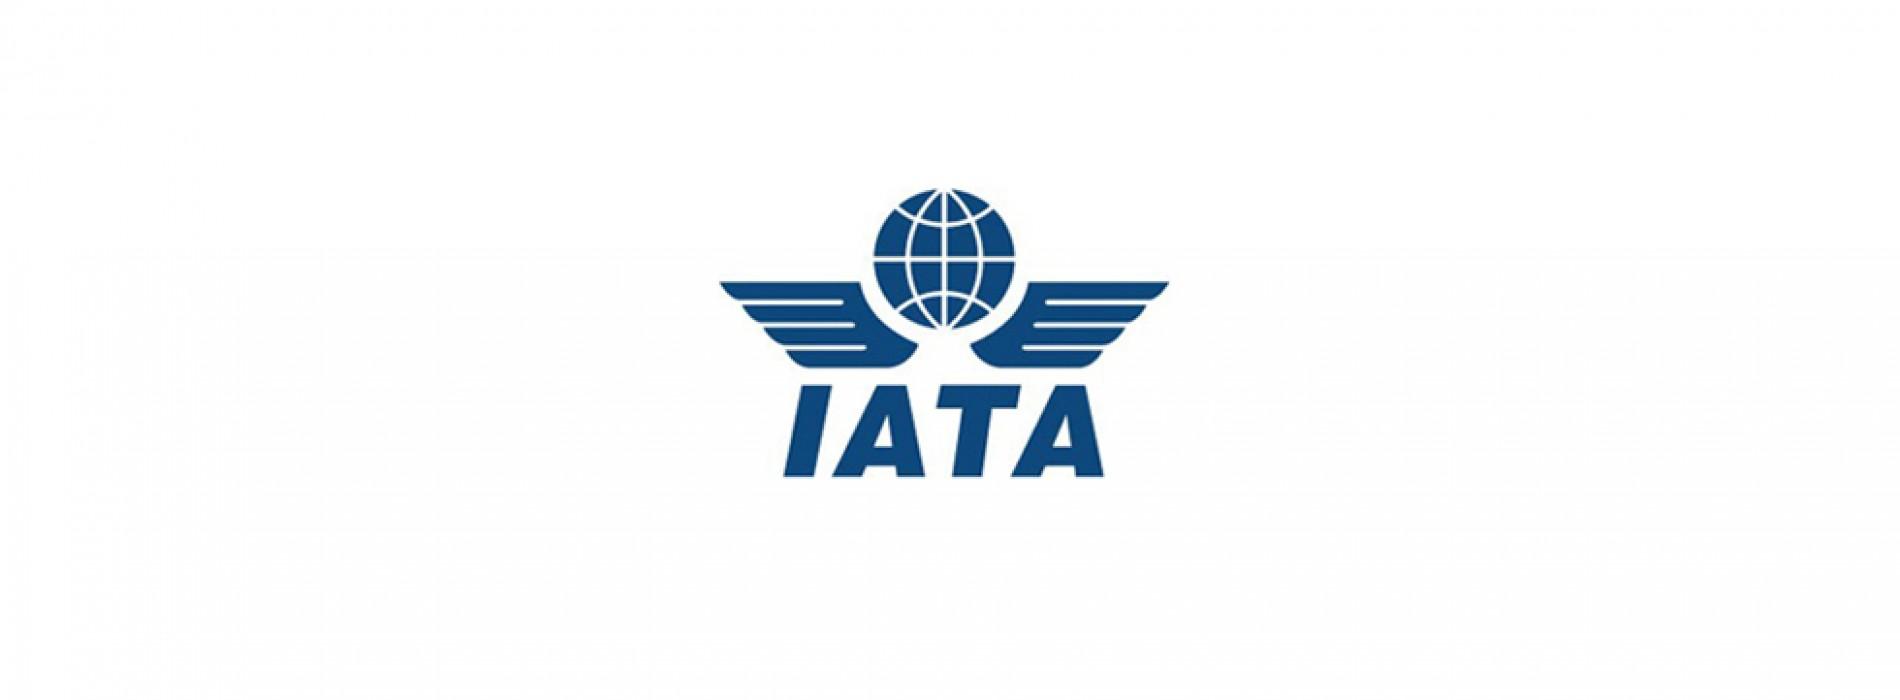 India's 2016 domestic passenger traffic up more than 23%: IATA